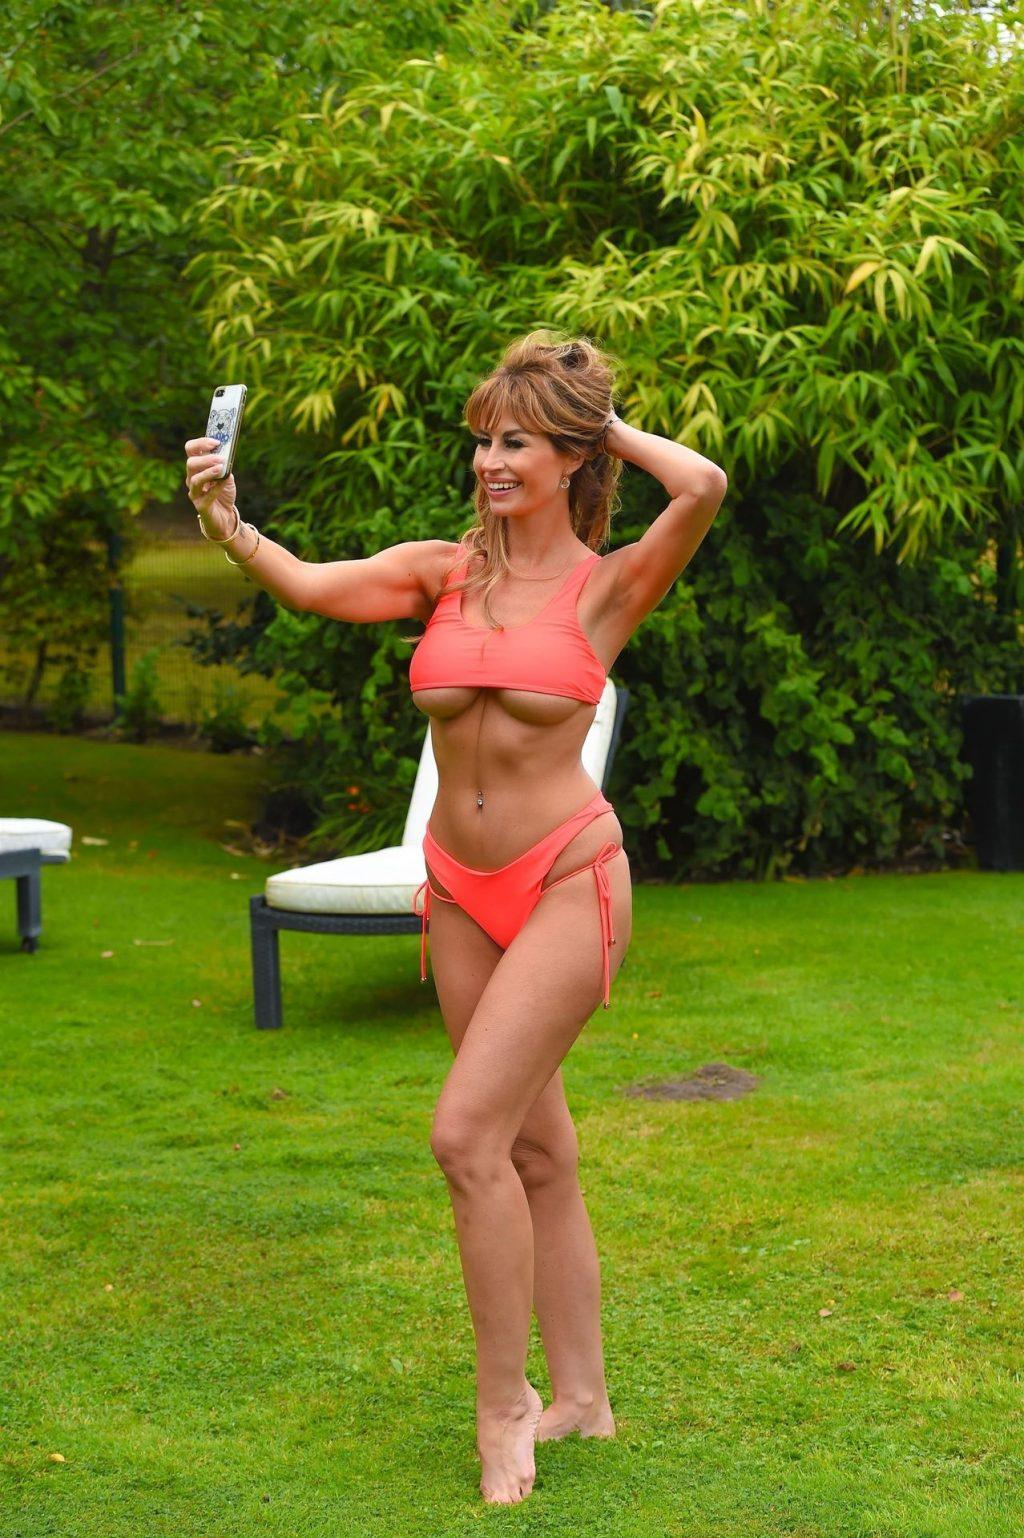 Ester Dee Shows Off Her Incredible Body in an Orange Bikini (10 Photos)